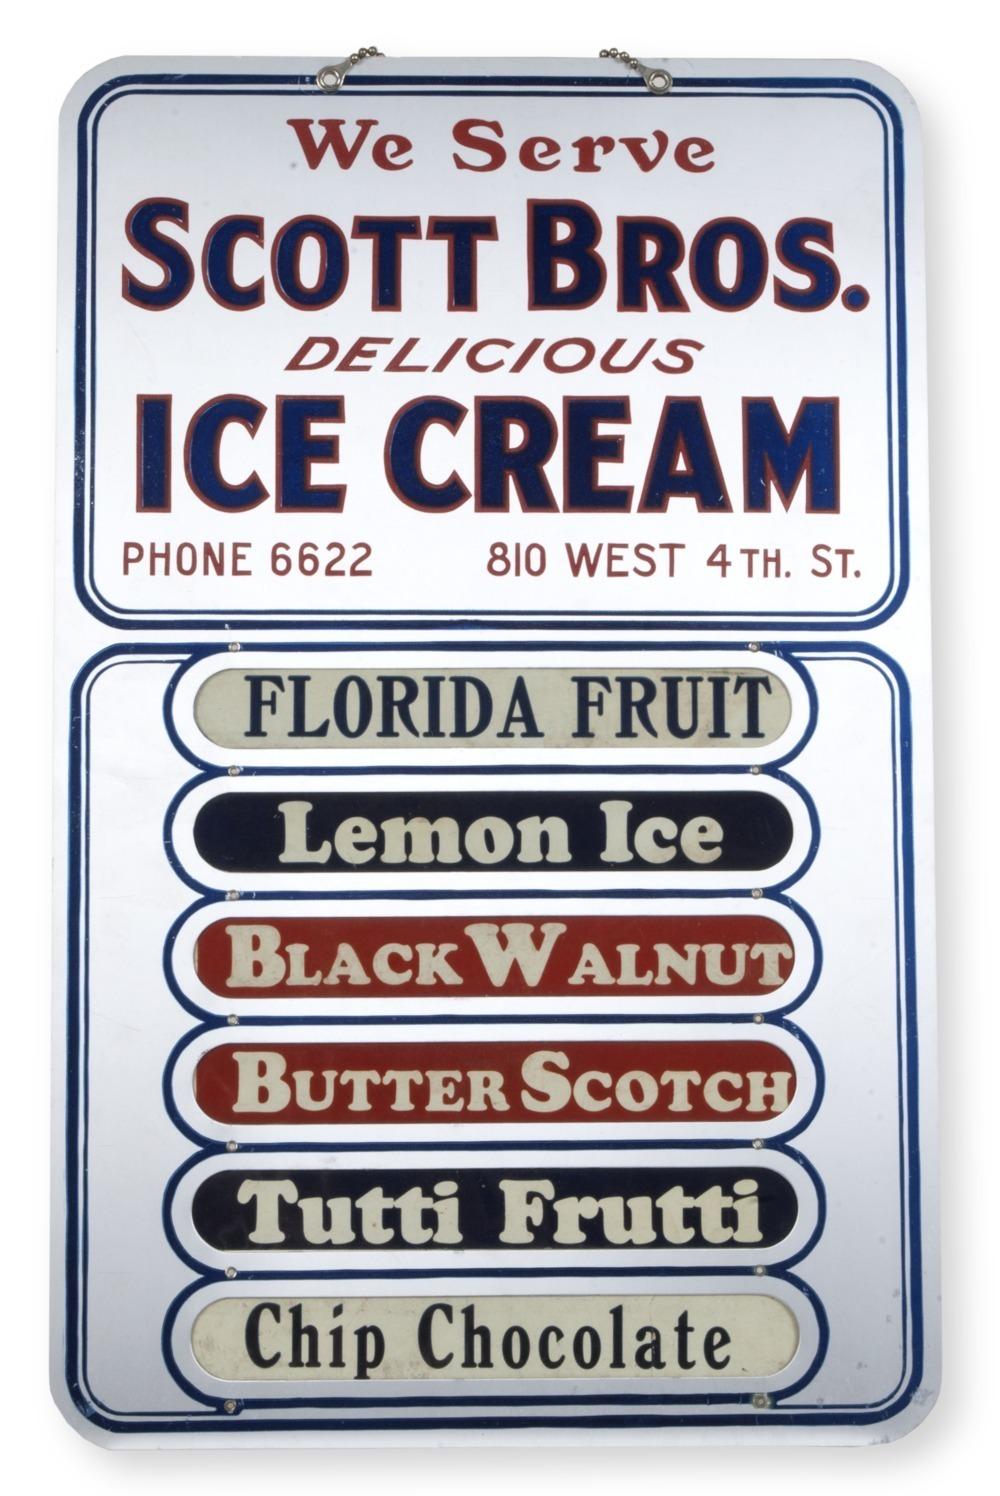 Scott Brothers Ice Cream sign